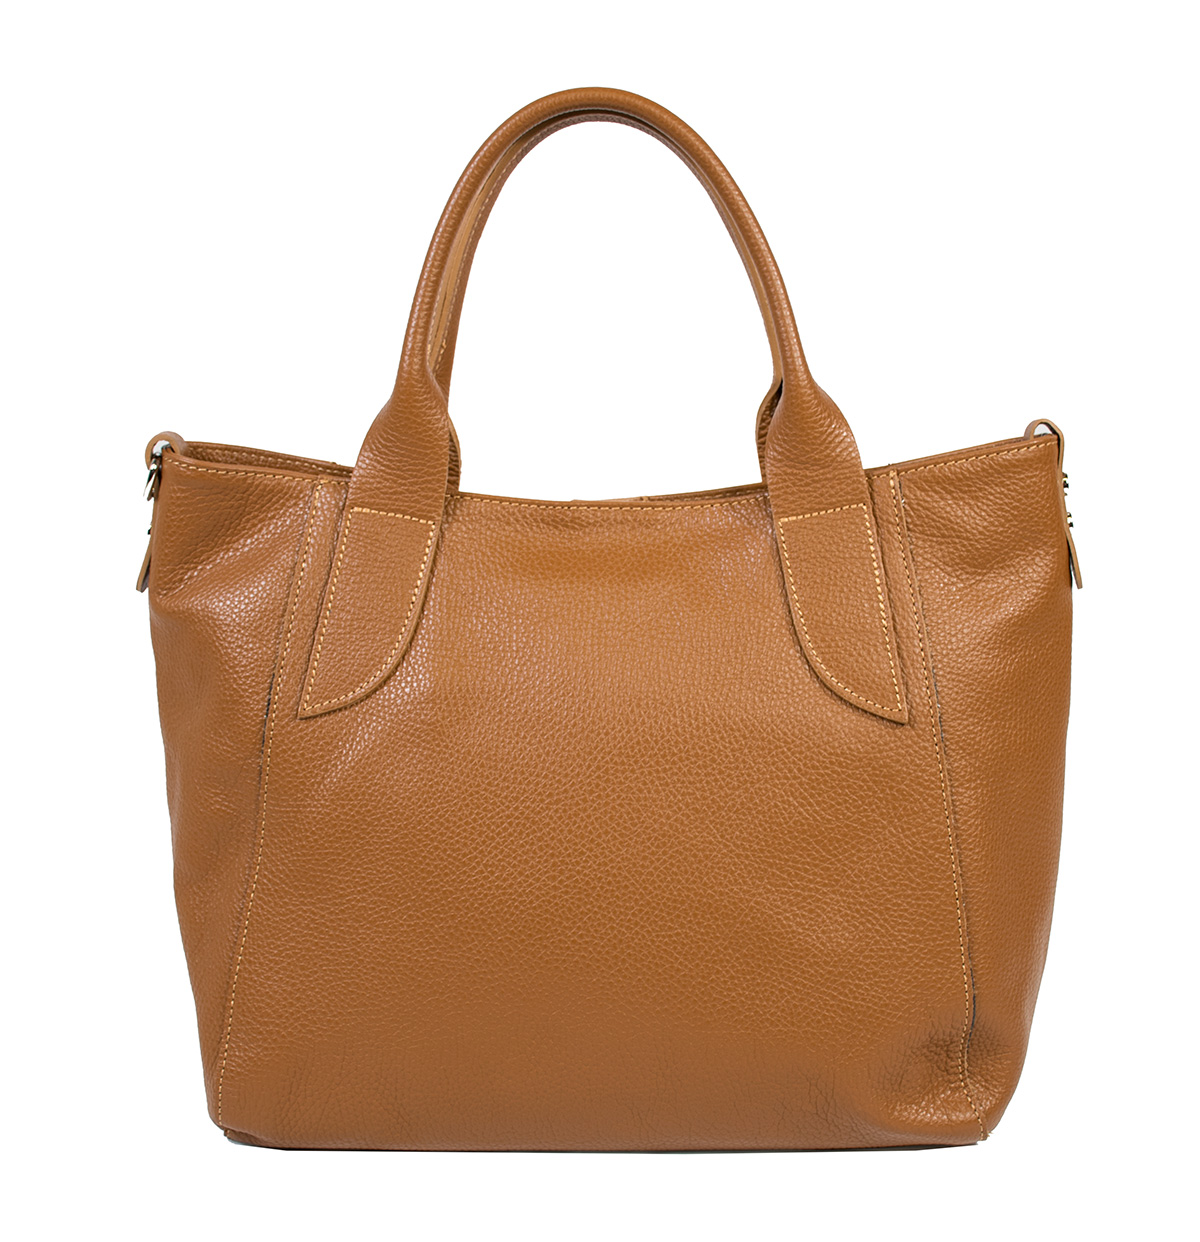 Bags and more Cameo Világos barna Női Bőr Kézitáska